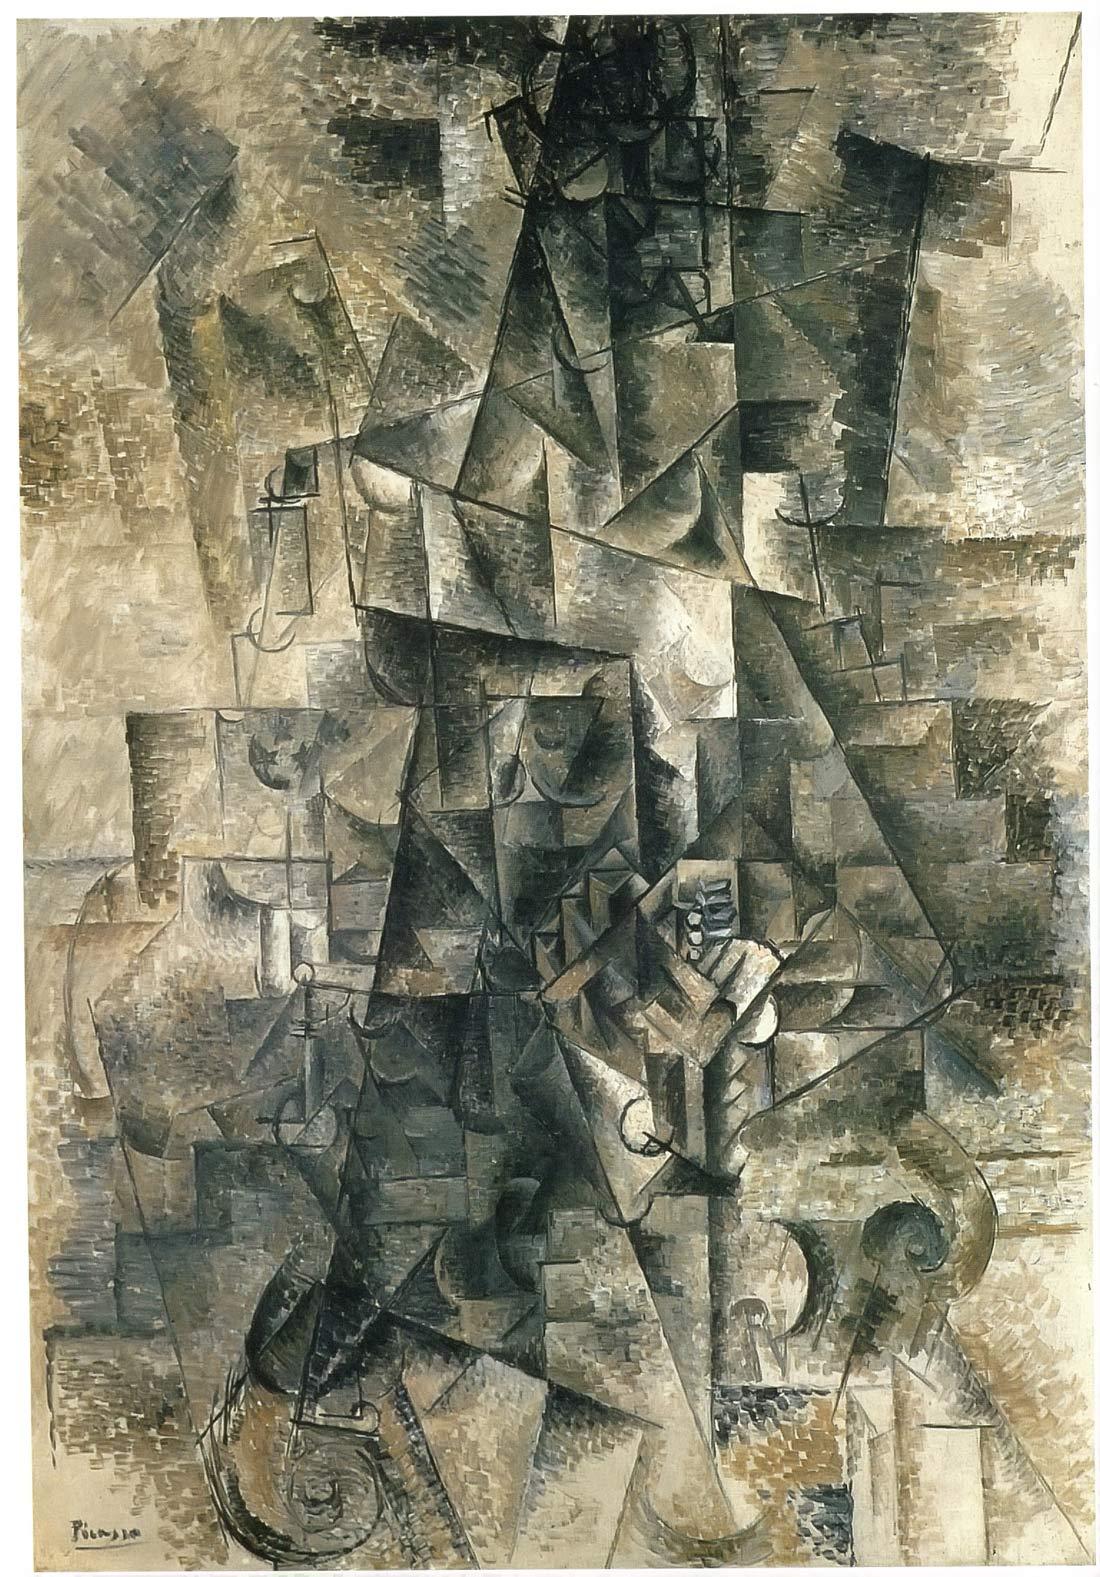 Accordionist Pablo Picasso